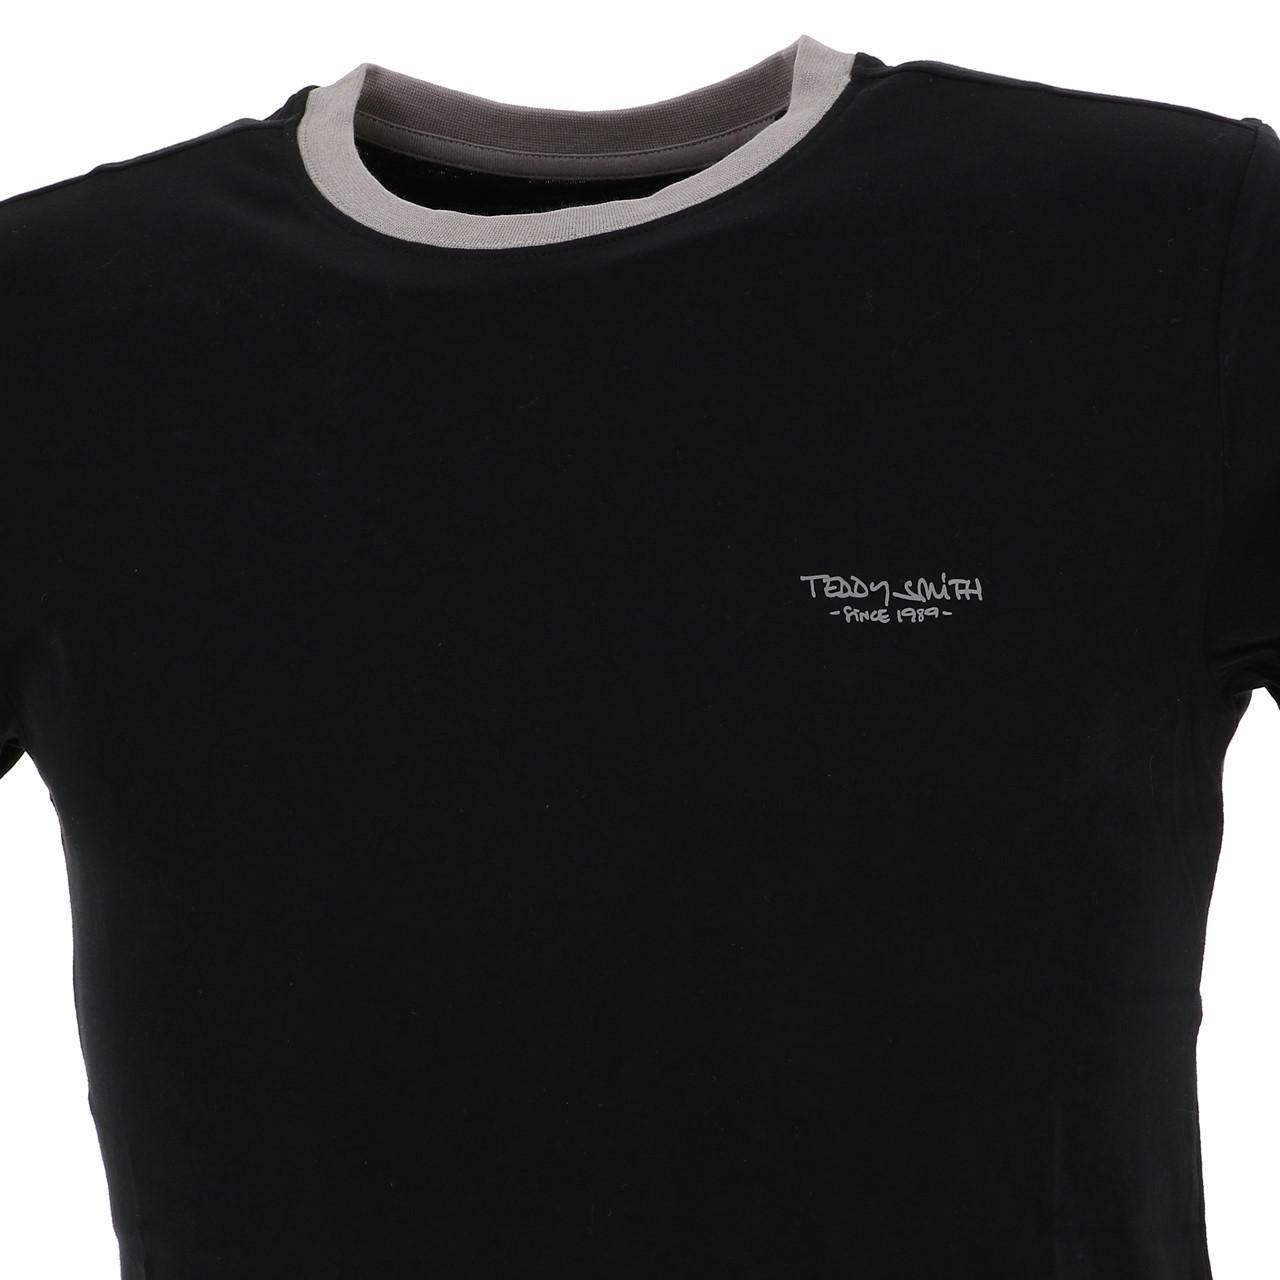 Short-Sleeve-T-Shirt-Teddy-Smith-the-Tee-Mc-Black-Black-65767-New thumbnail 2